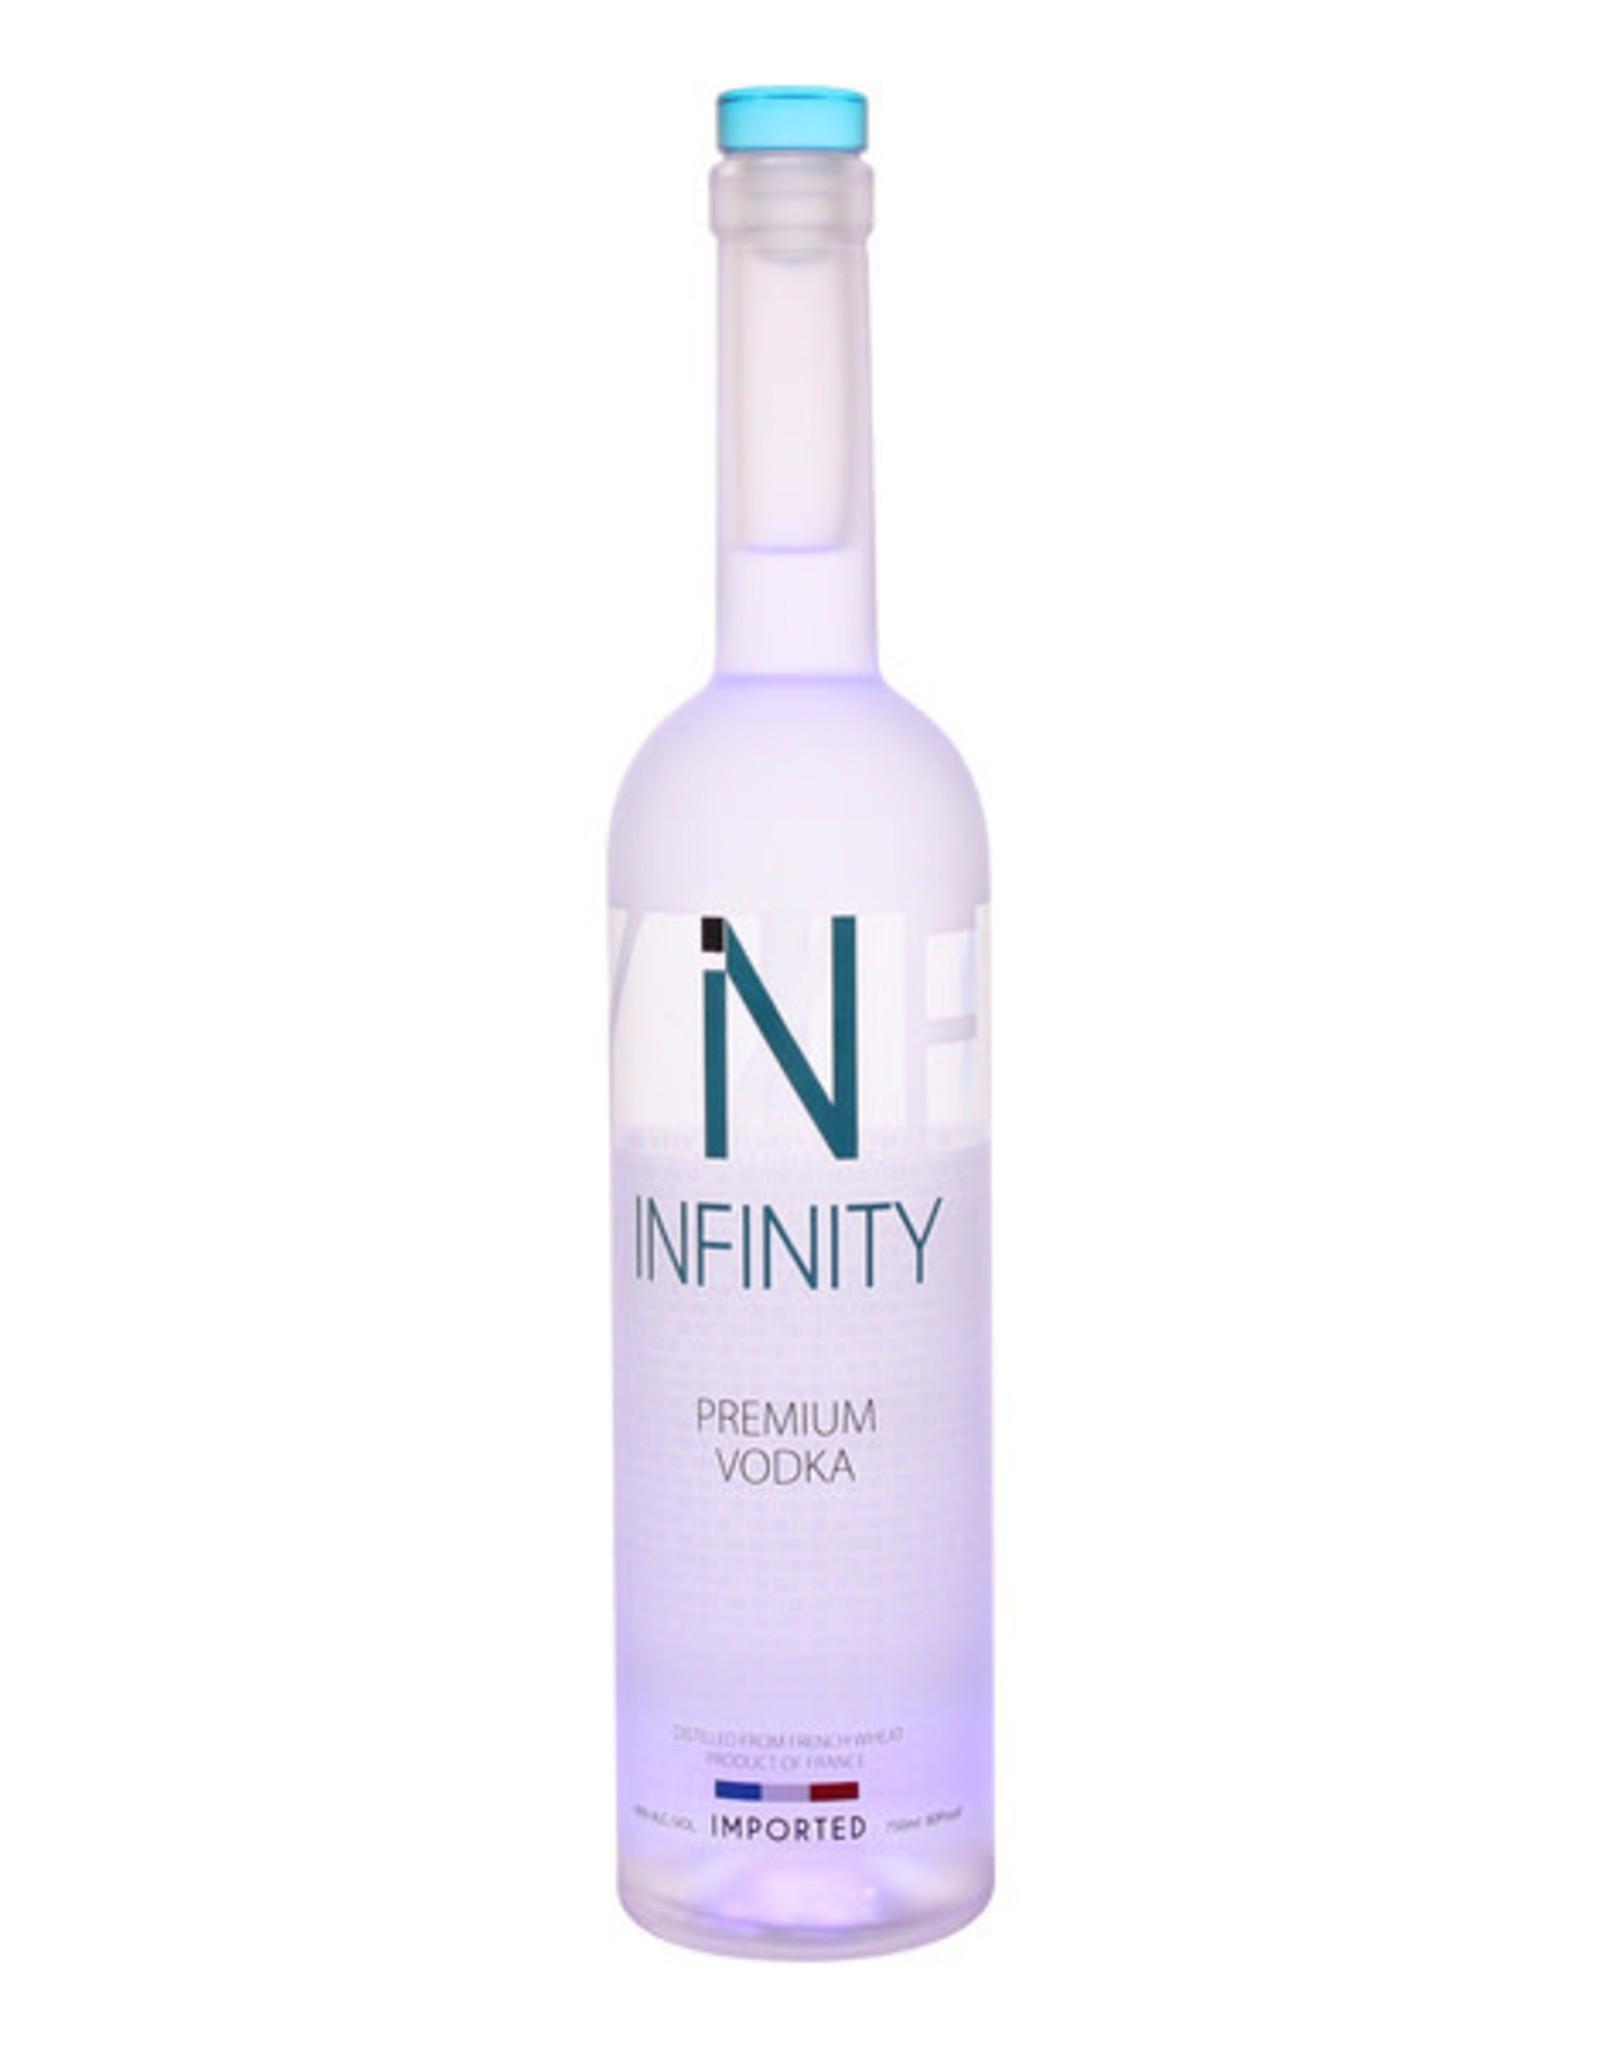 INFINITY PREMIUM VODKA 1L